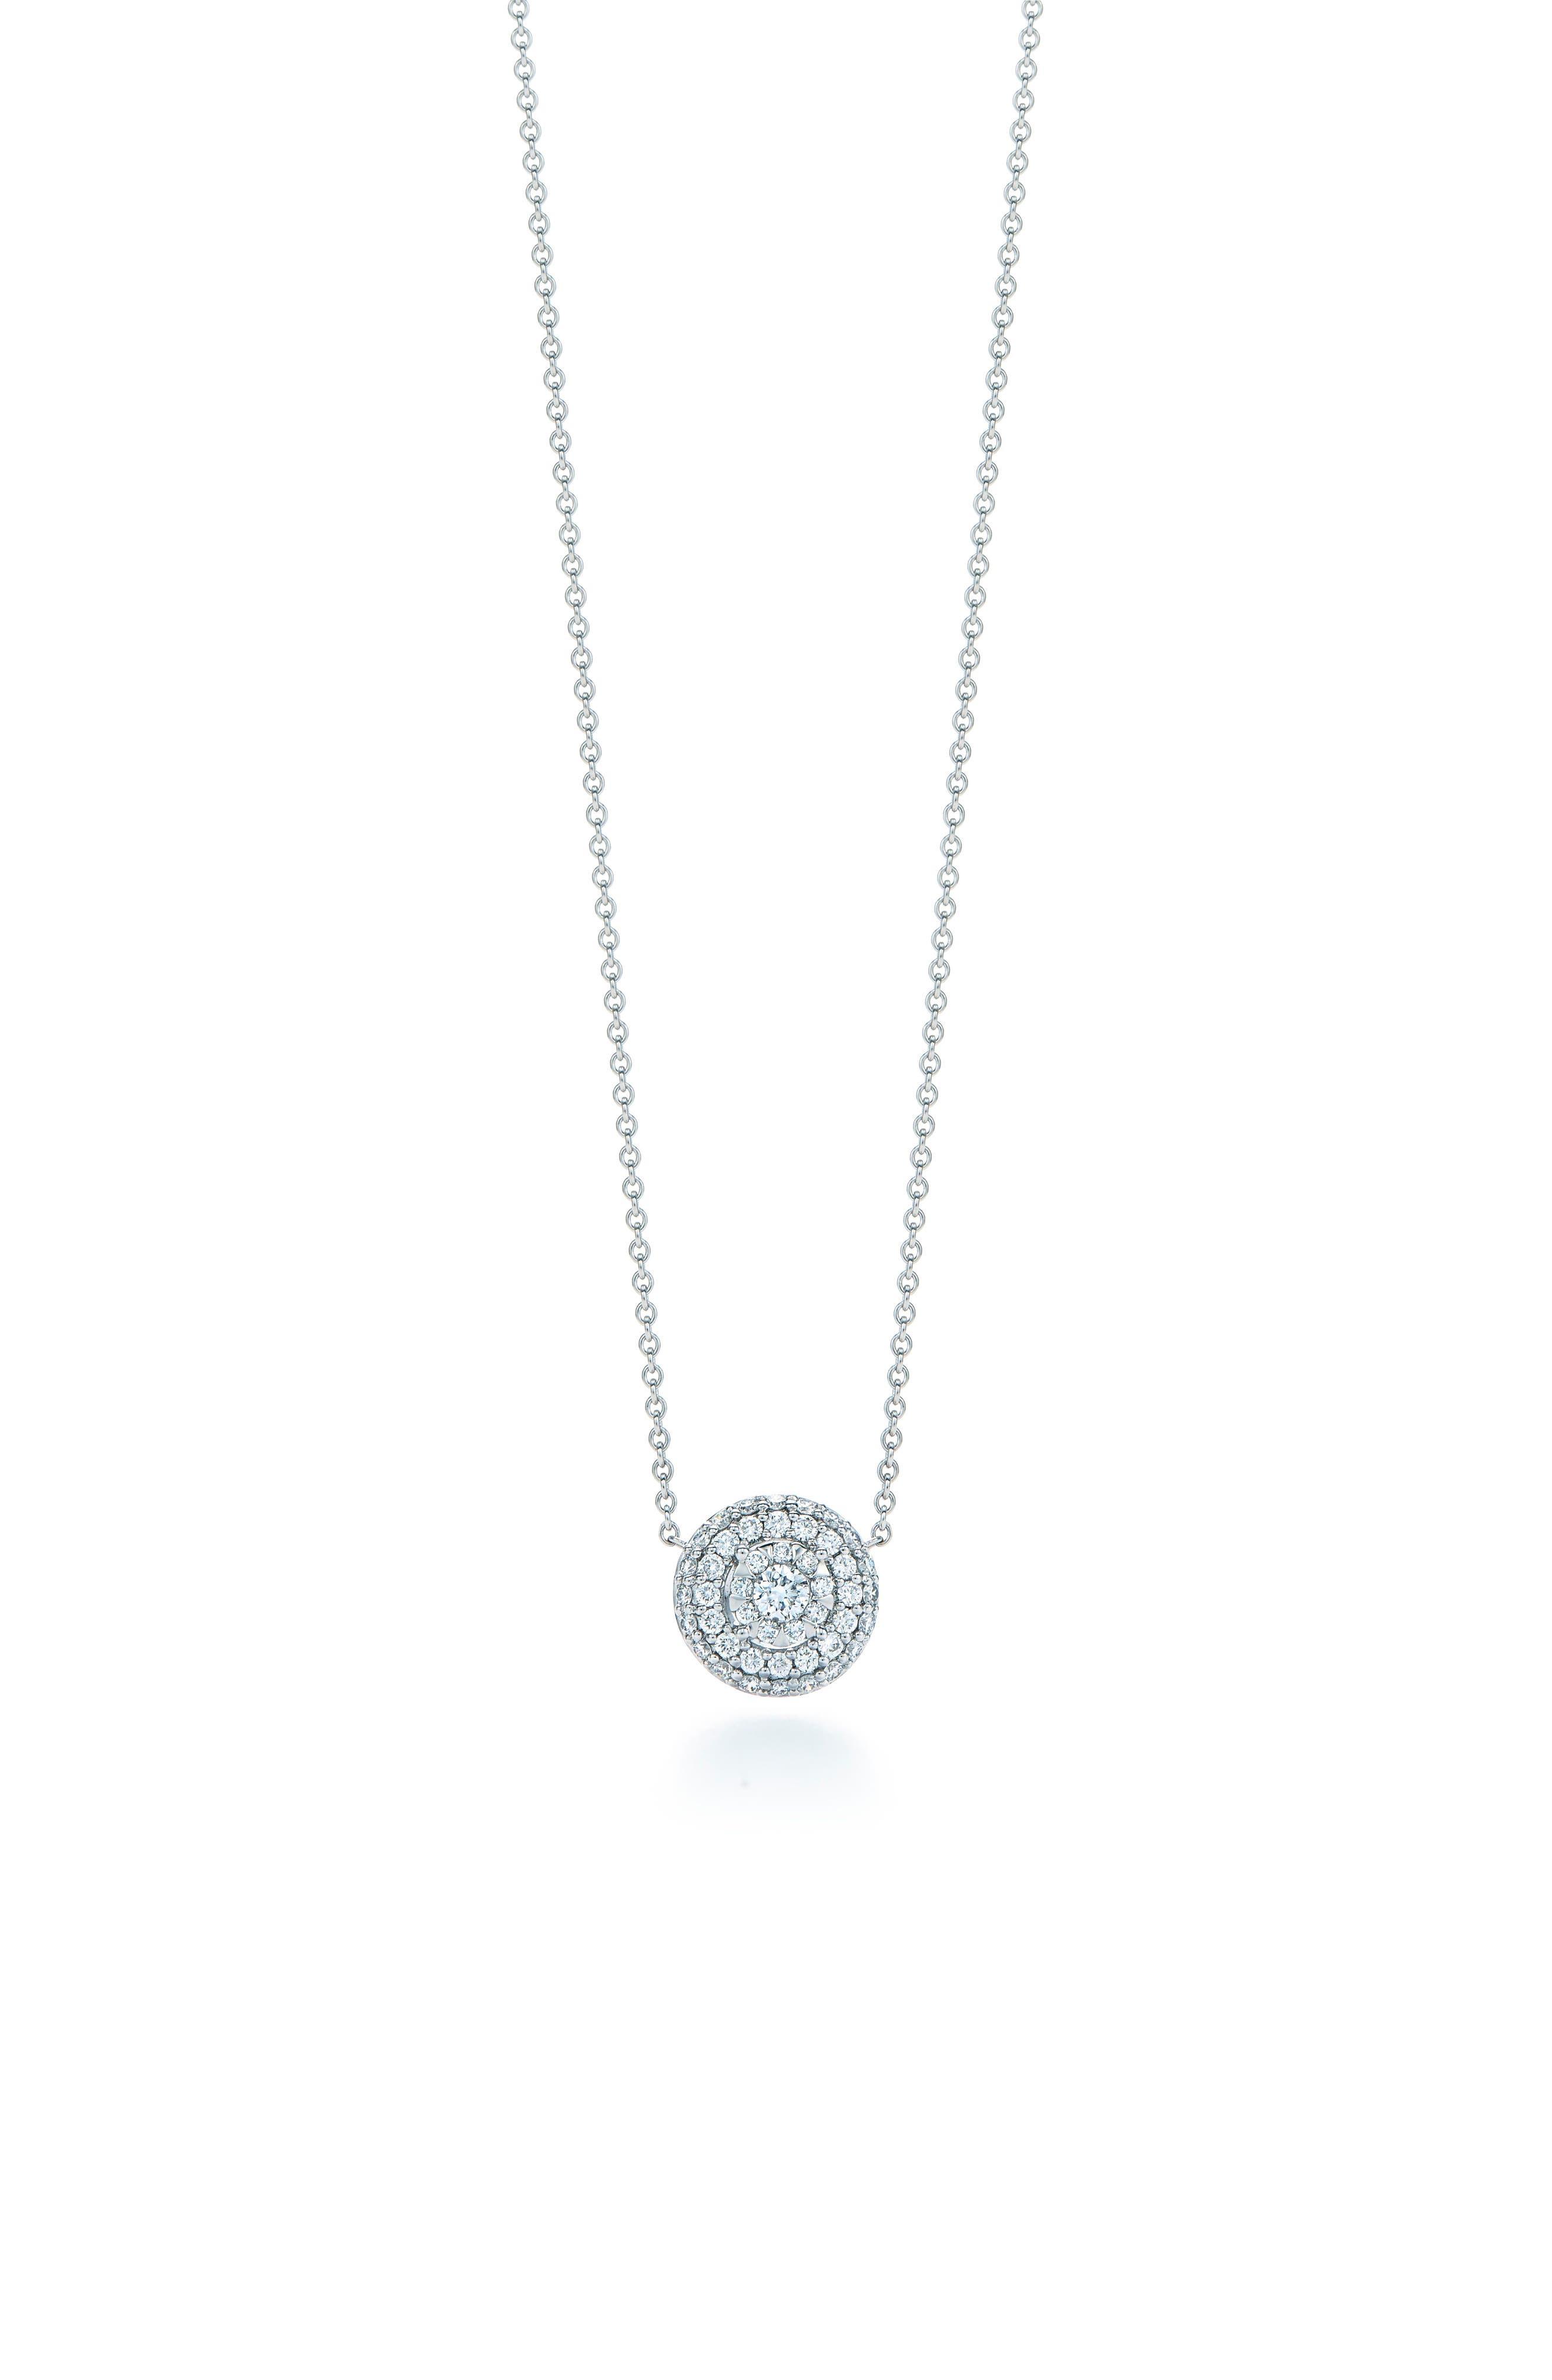 Alternate Image 1 Selected - Kwiat Sunburst Pavé Diamond Double Halo Pendant Necklace